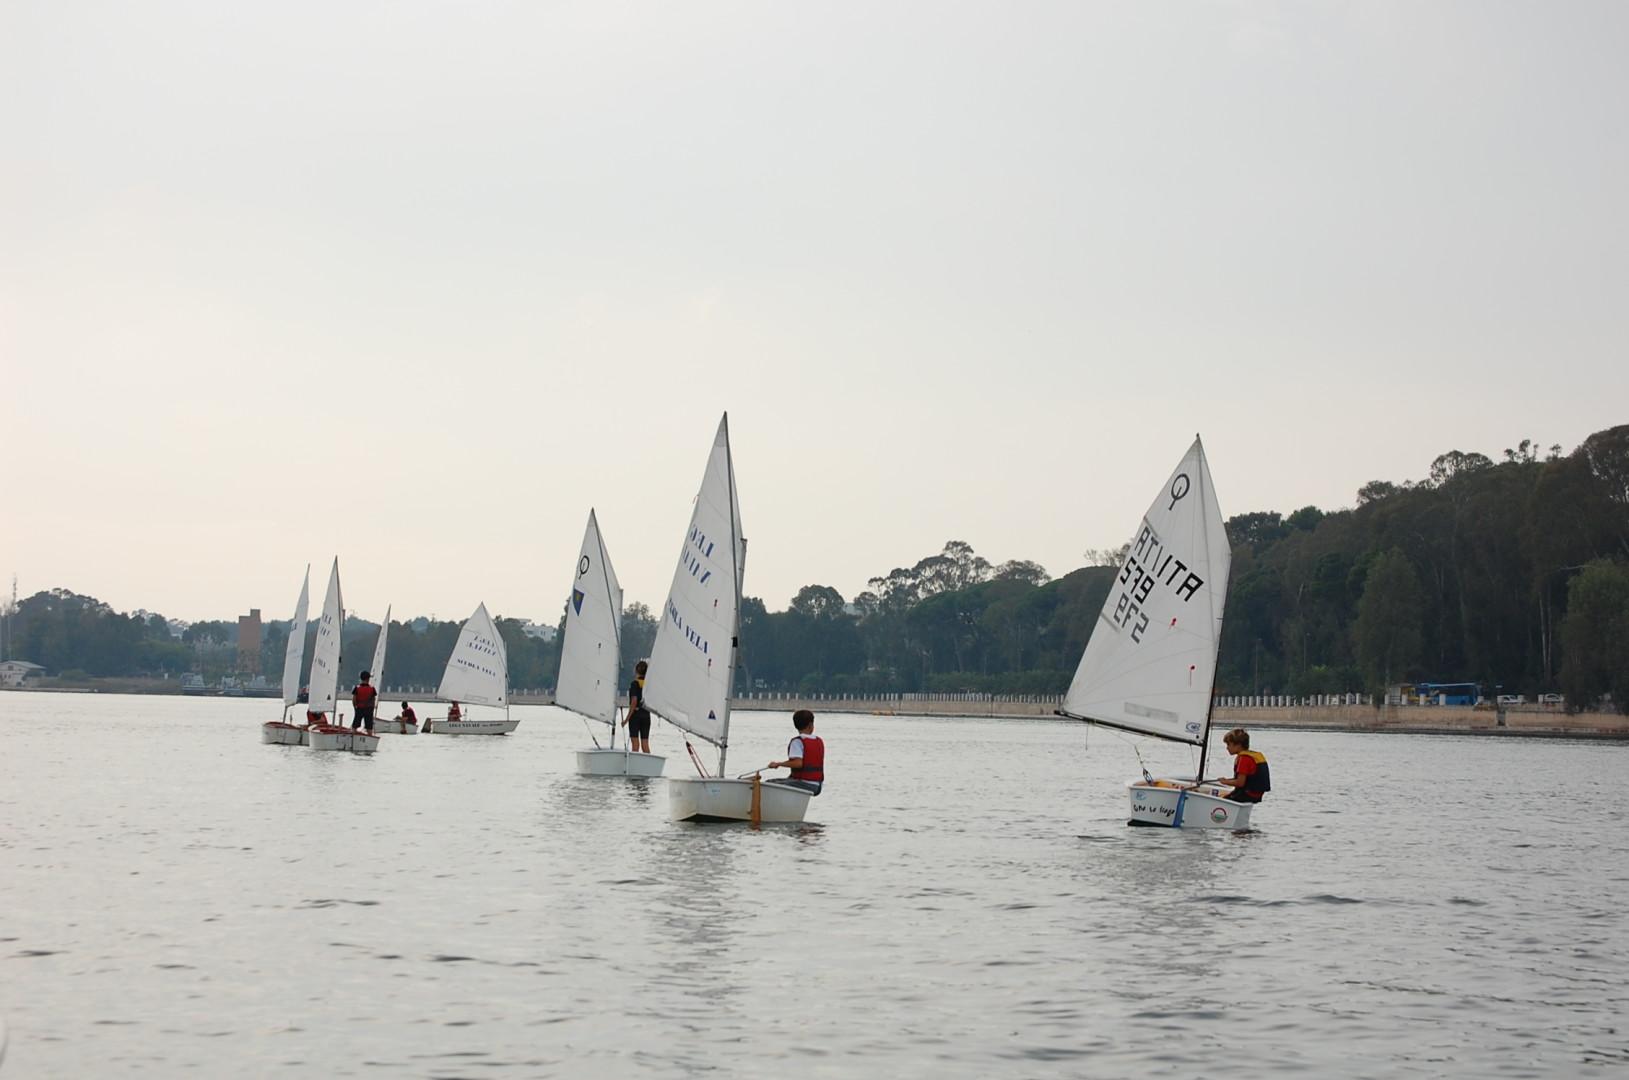 Scuola-di-vela-lega-navale-LNI-Brindisi (19)